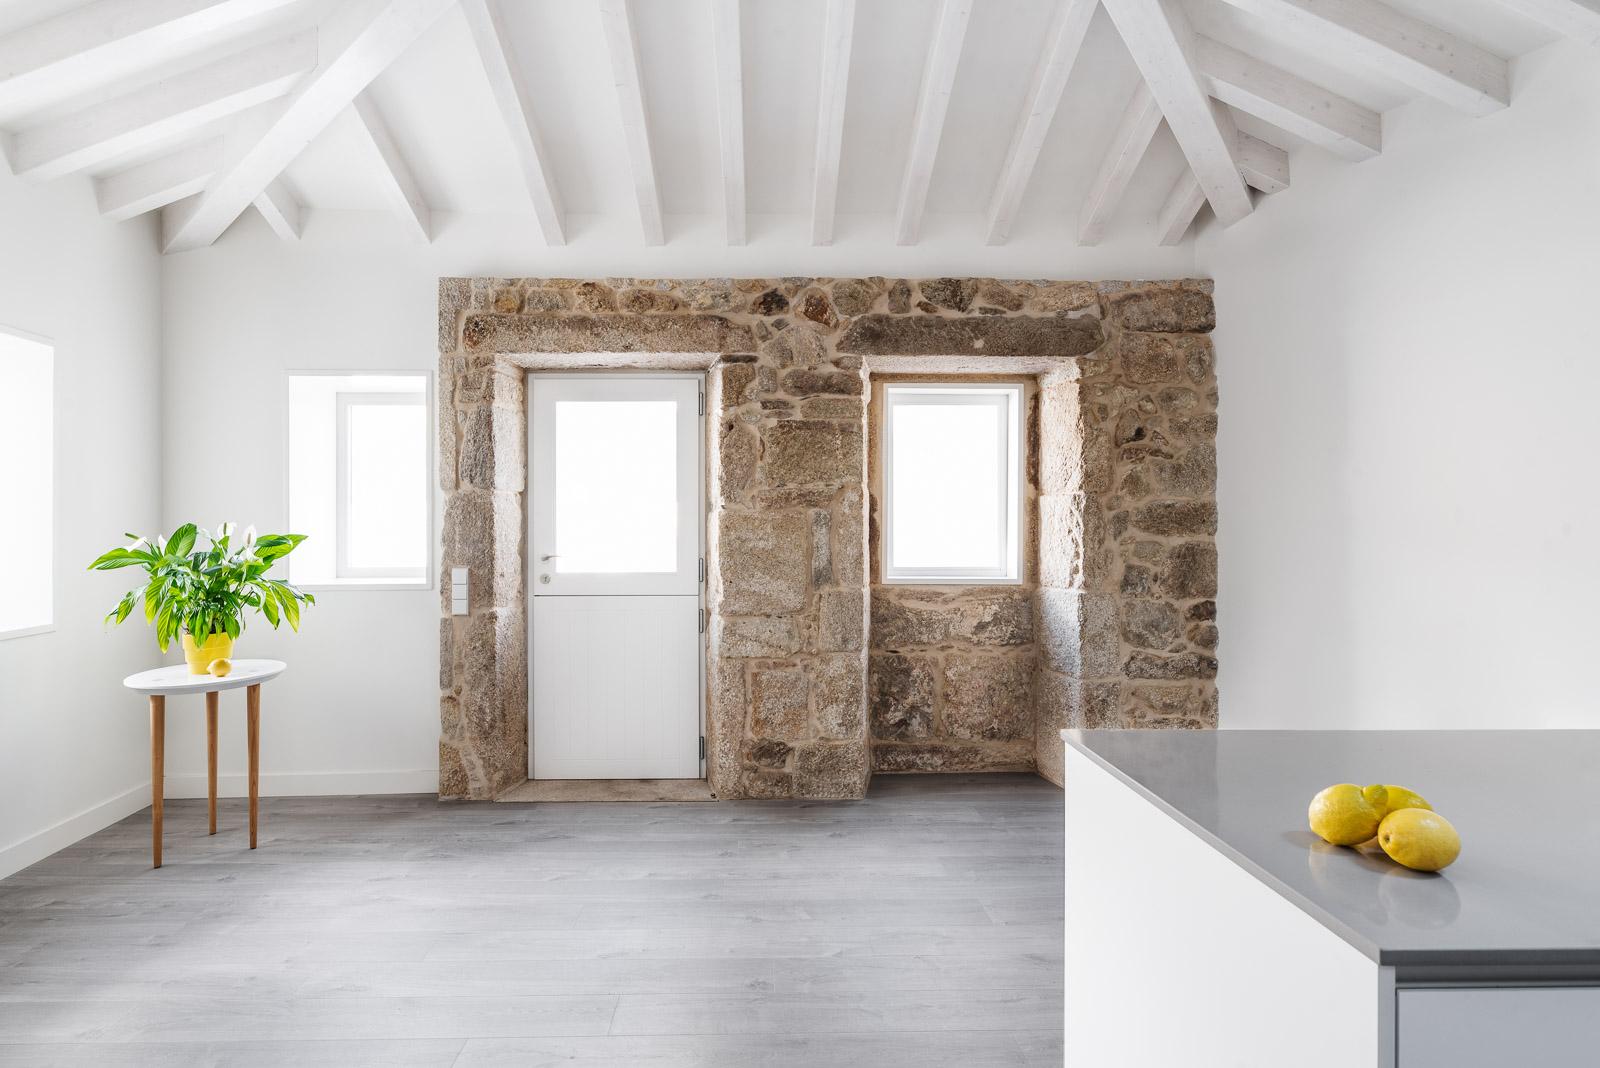 fotógrafo de arquitectura en galicia